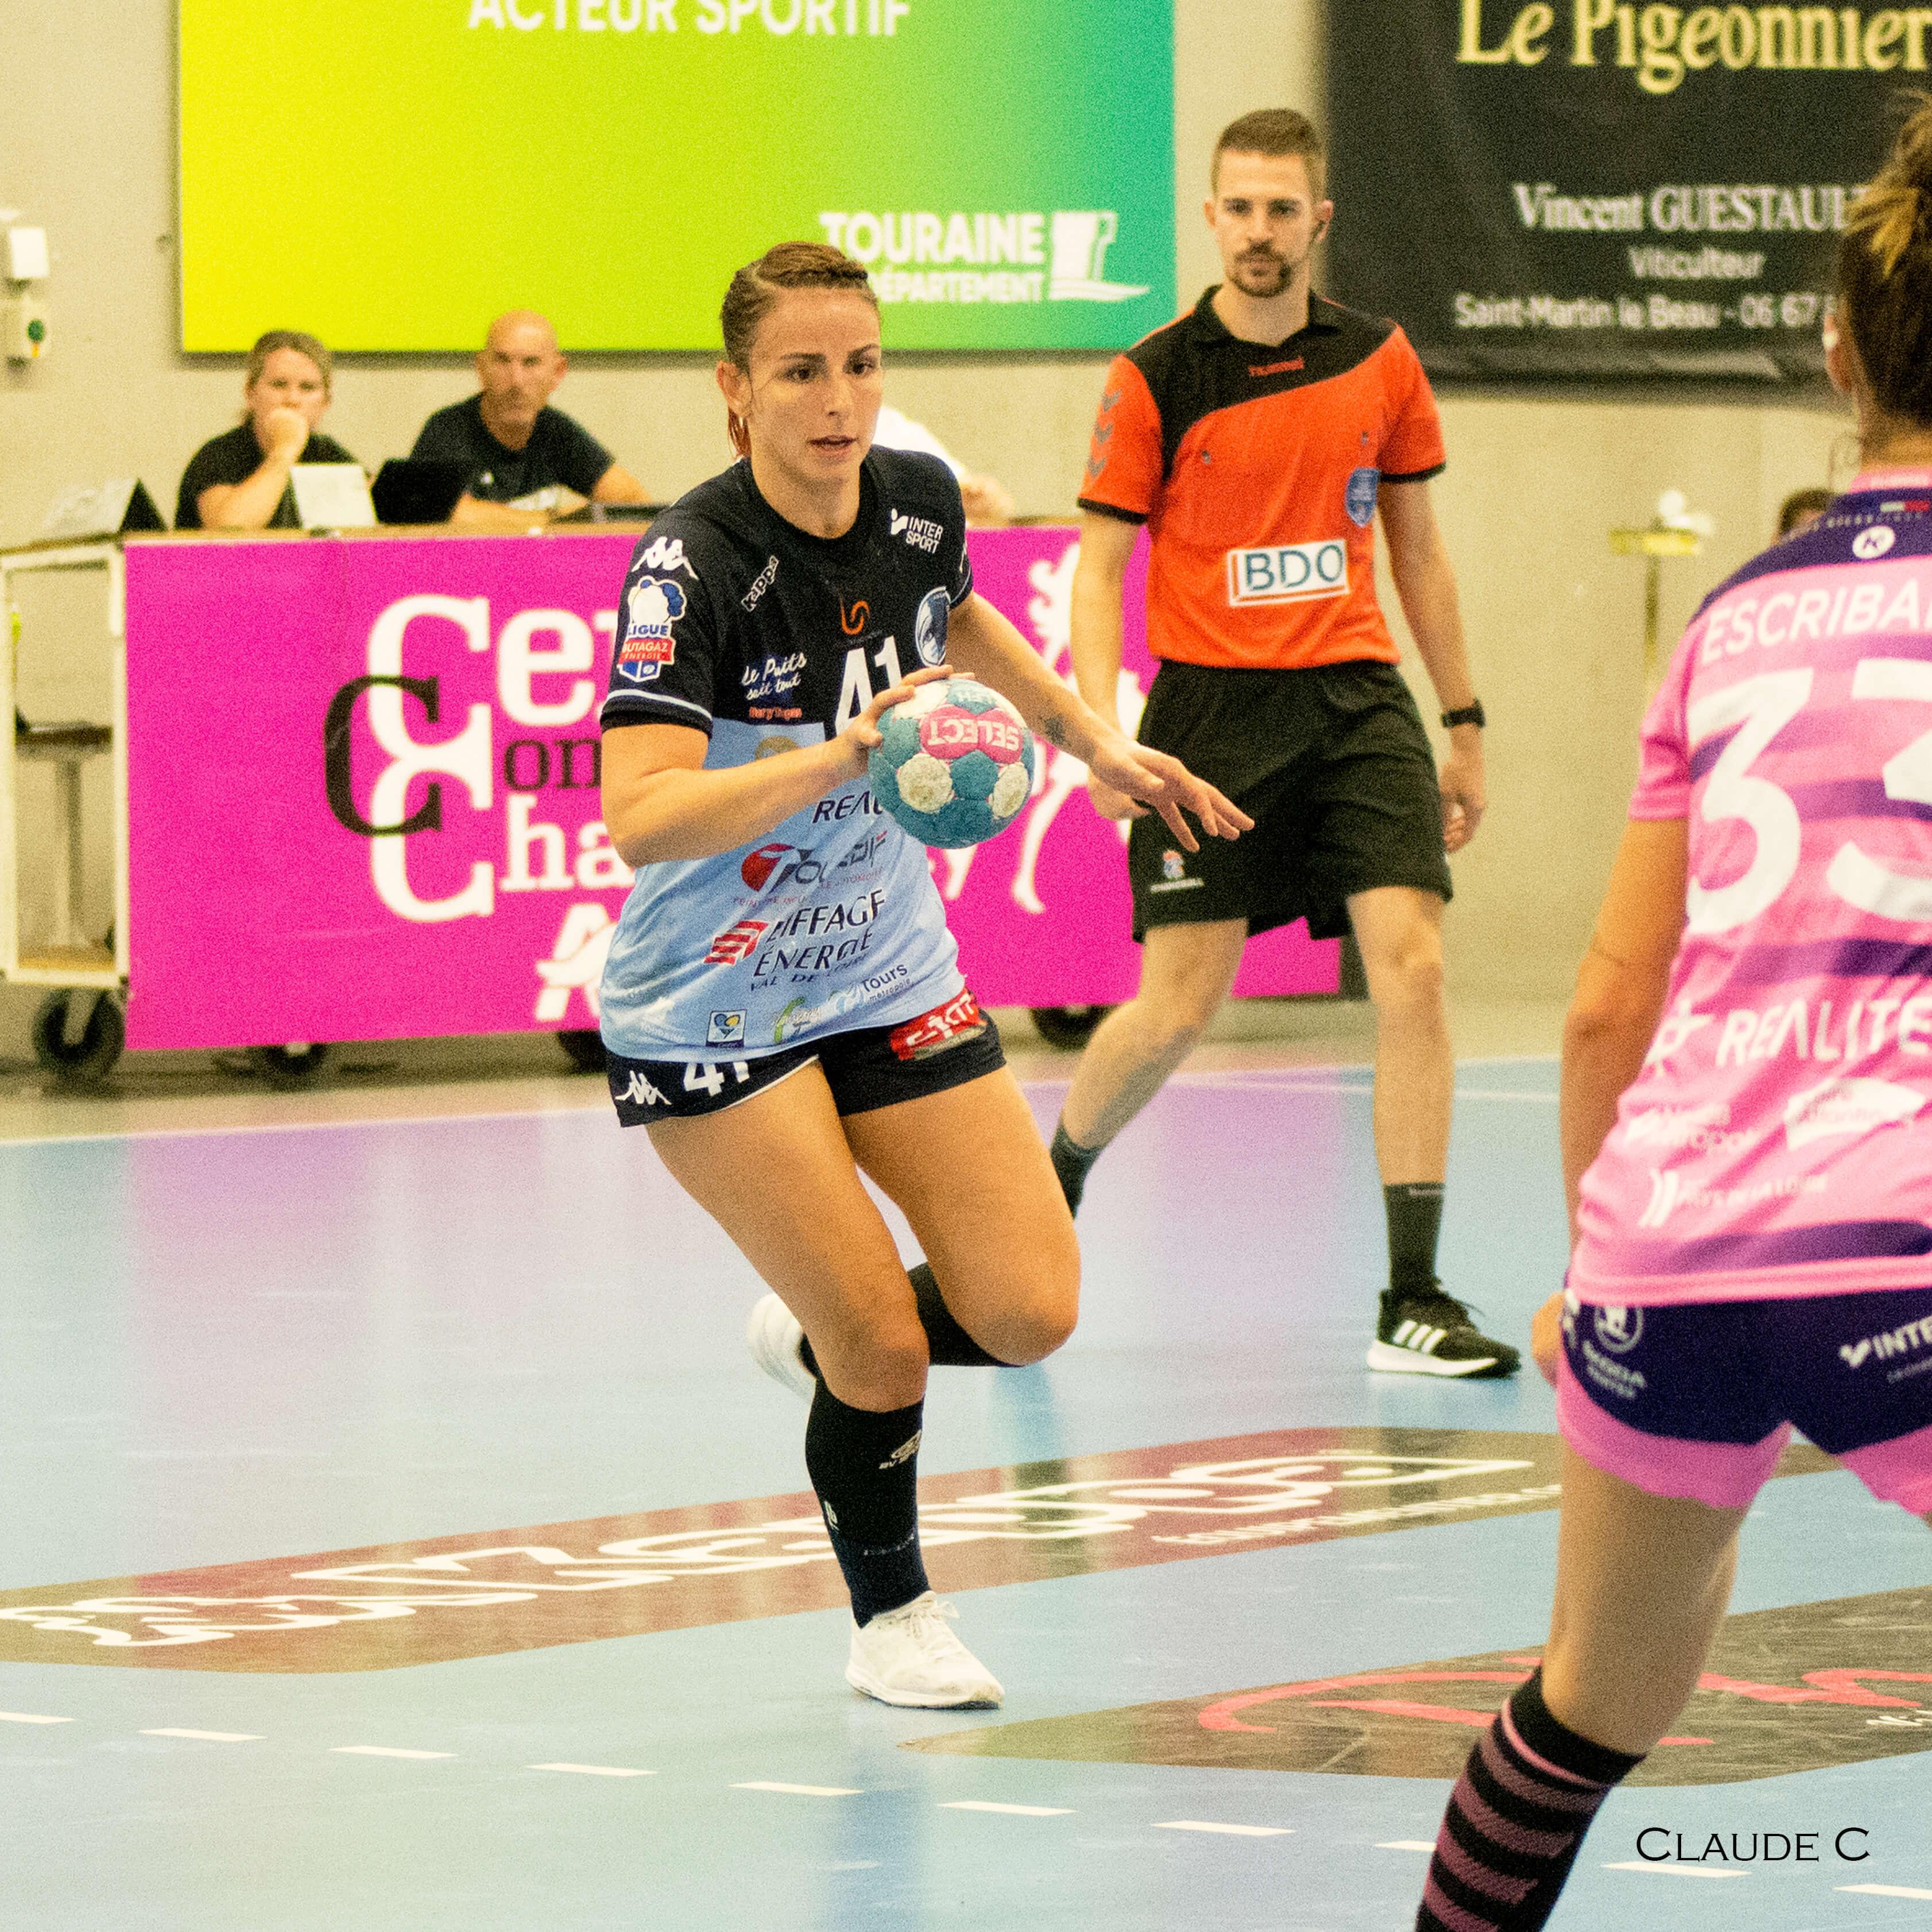 CTHB-Nantes 21 09 2019 (24)